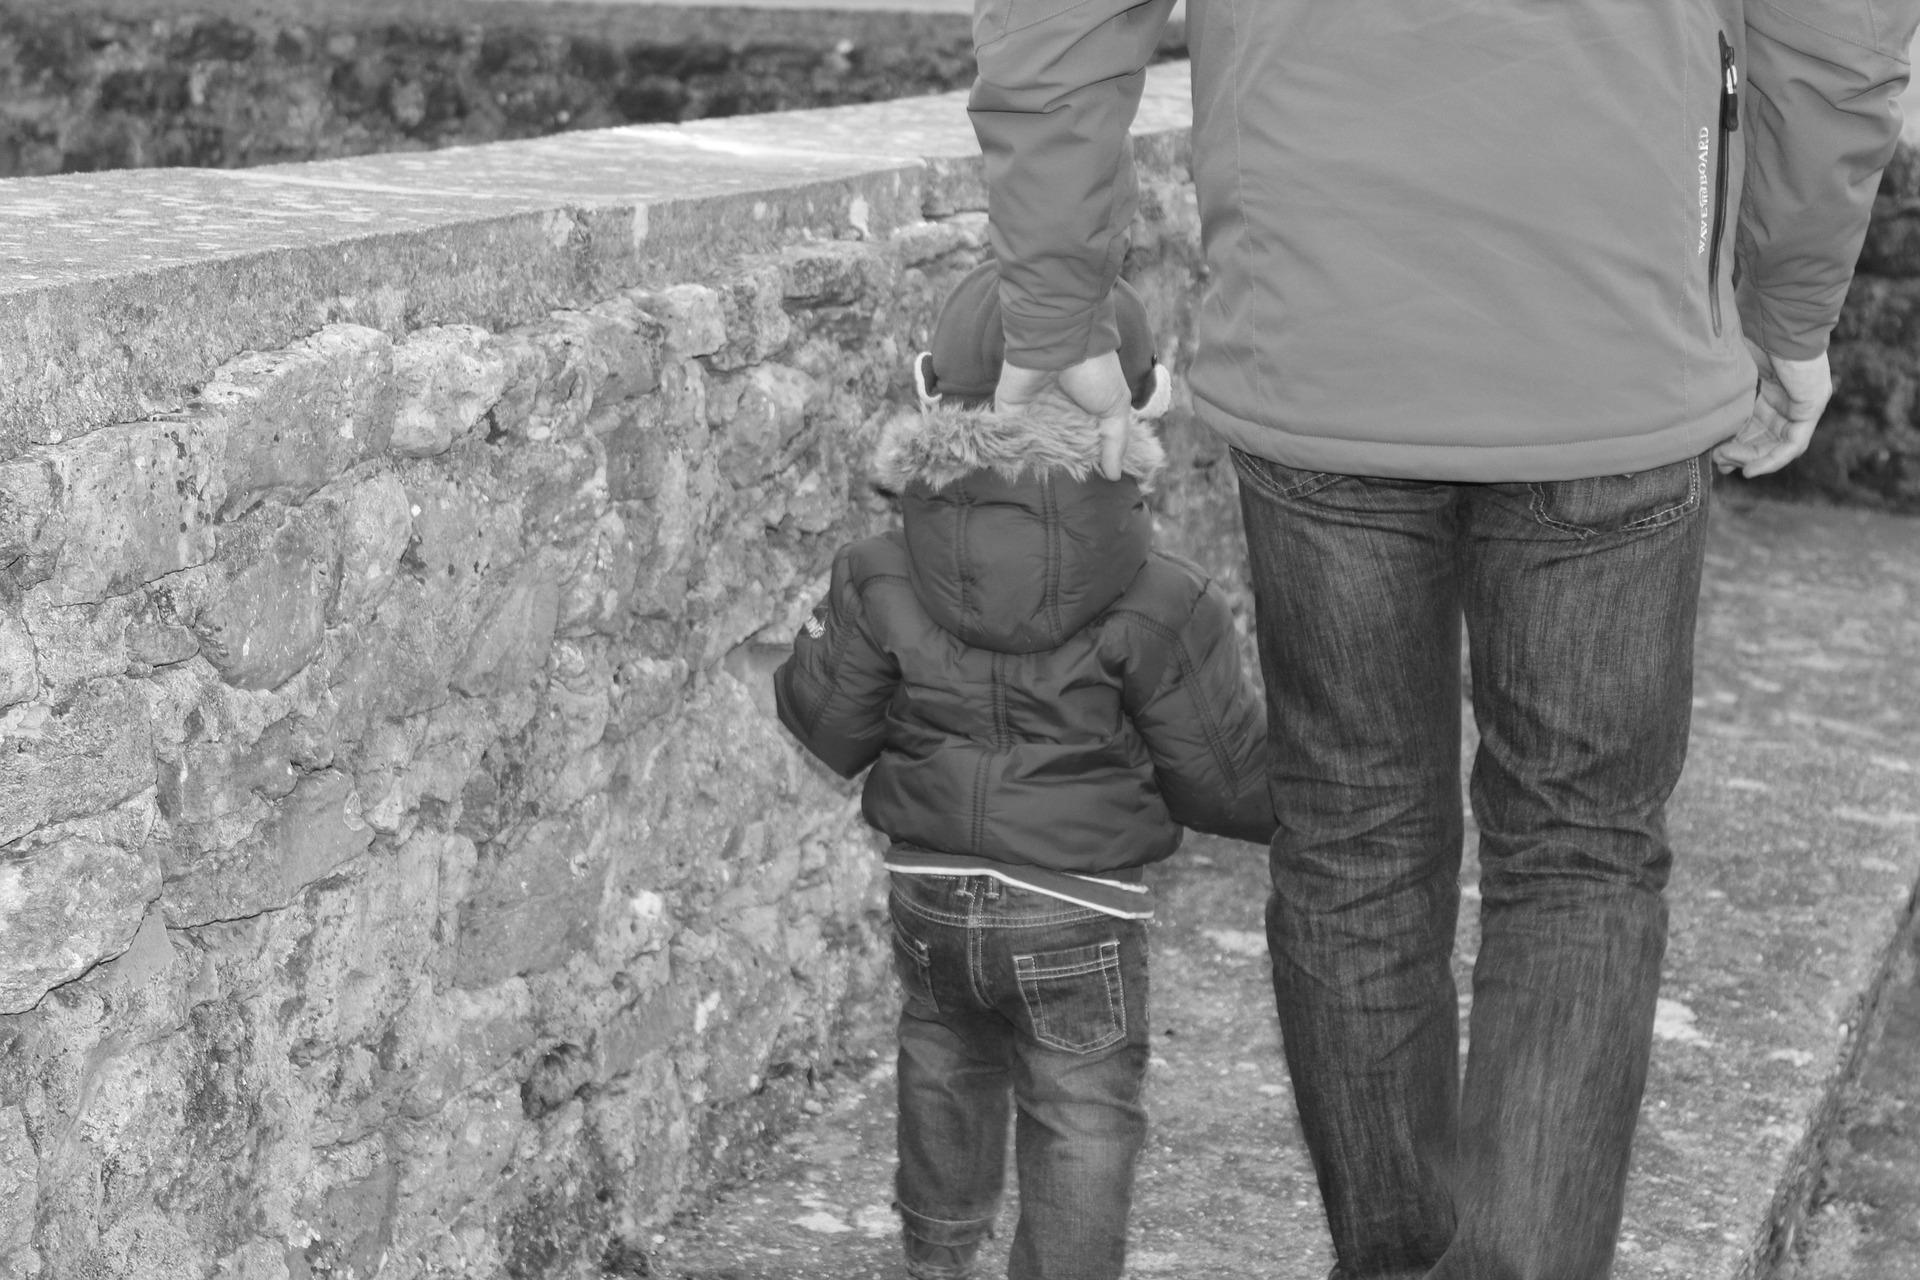 ¿Qué significa que mi hijo tenga problemas de conducta? ¿A partir de qué se considera problema de conducta?